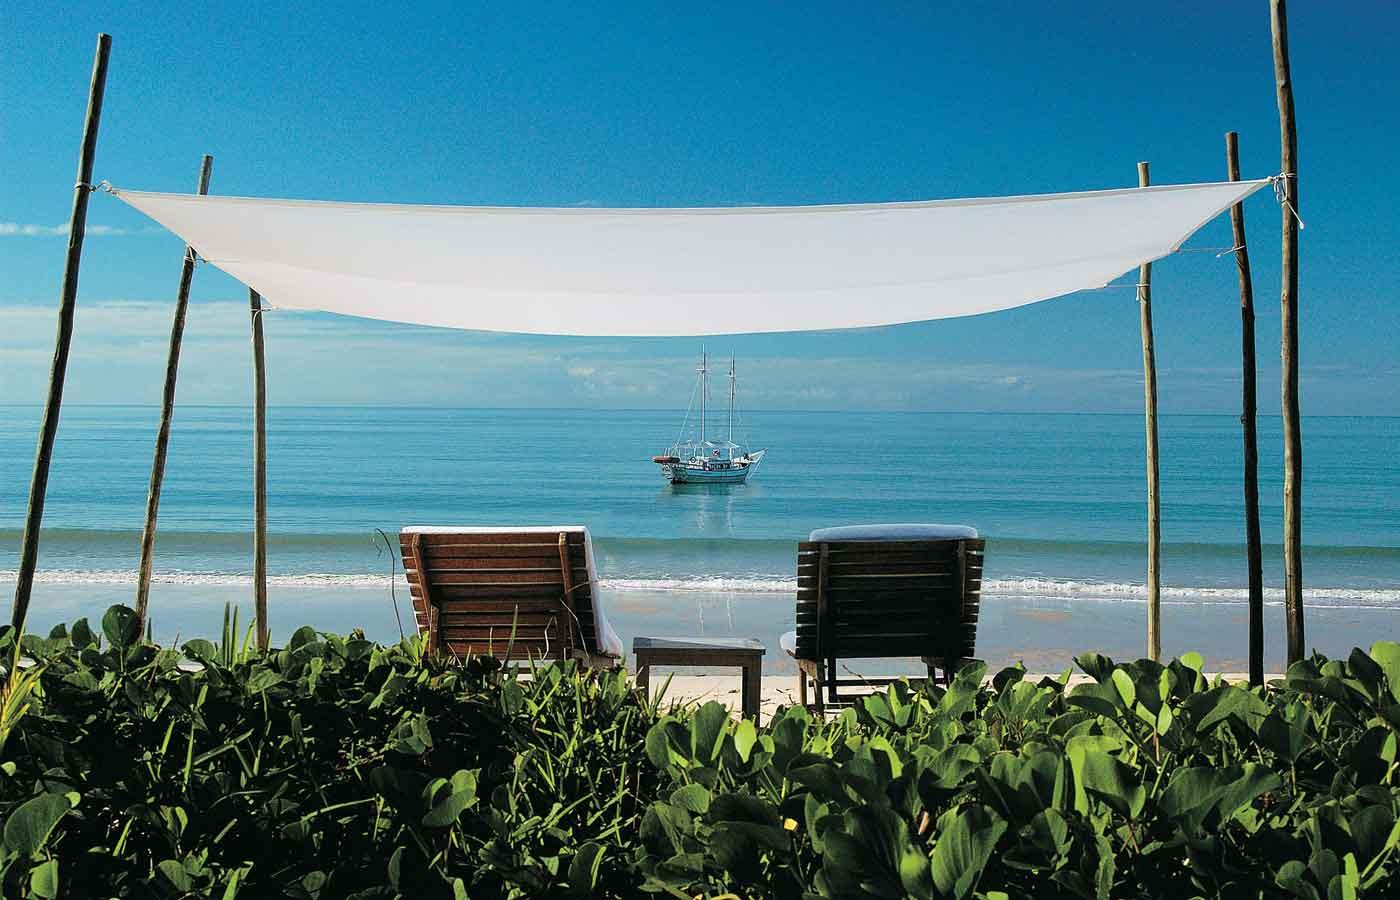 Fazenda Sao Francisco do Corumbau - Luxury Holidays to Bahia, Brazil